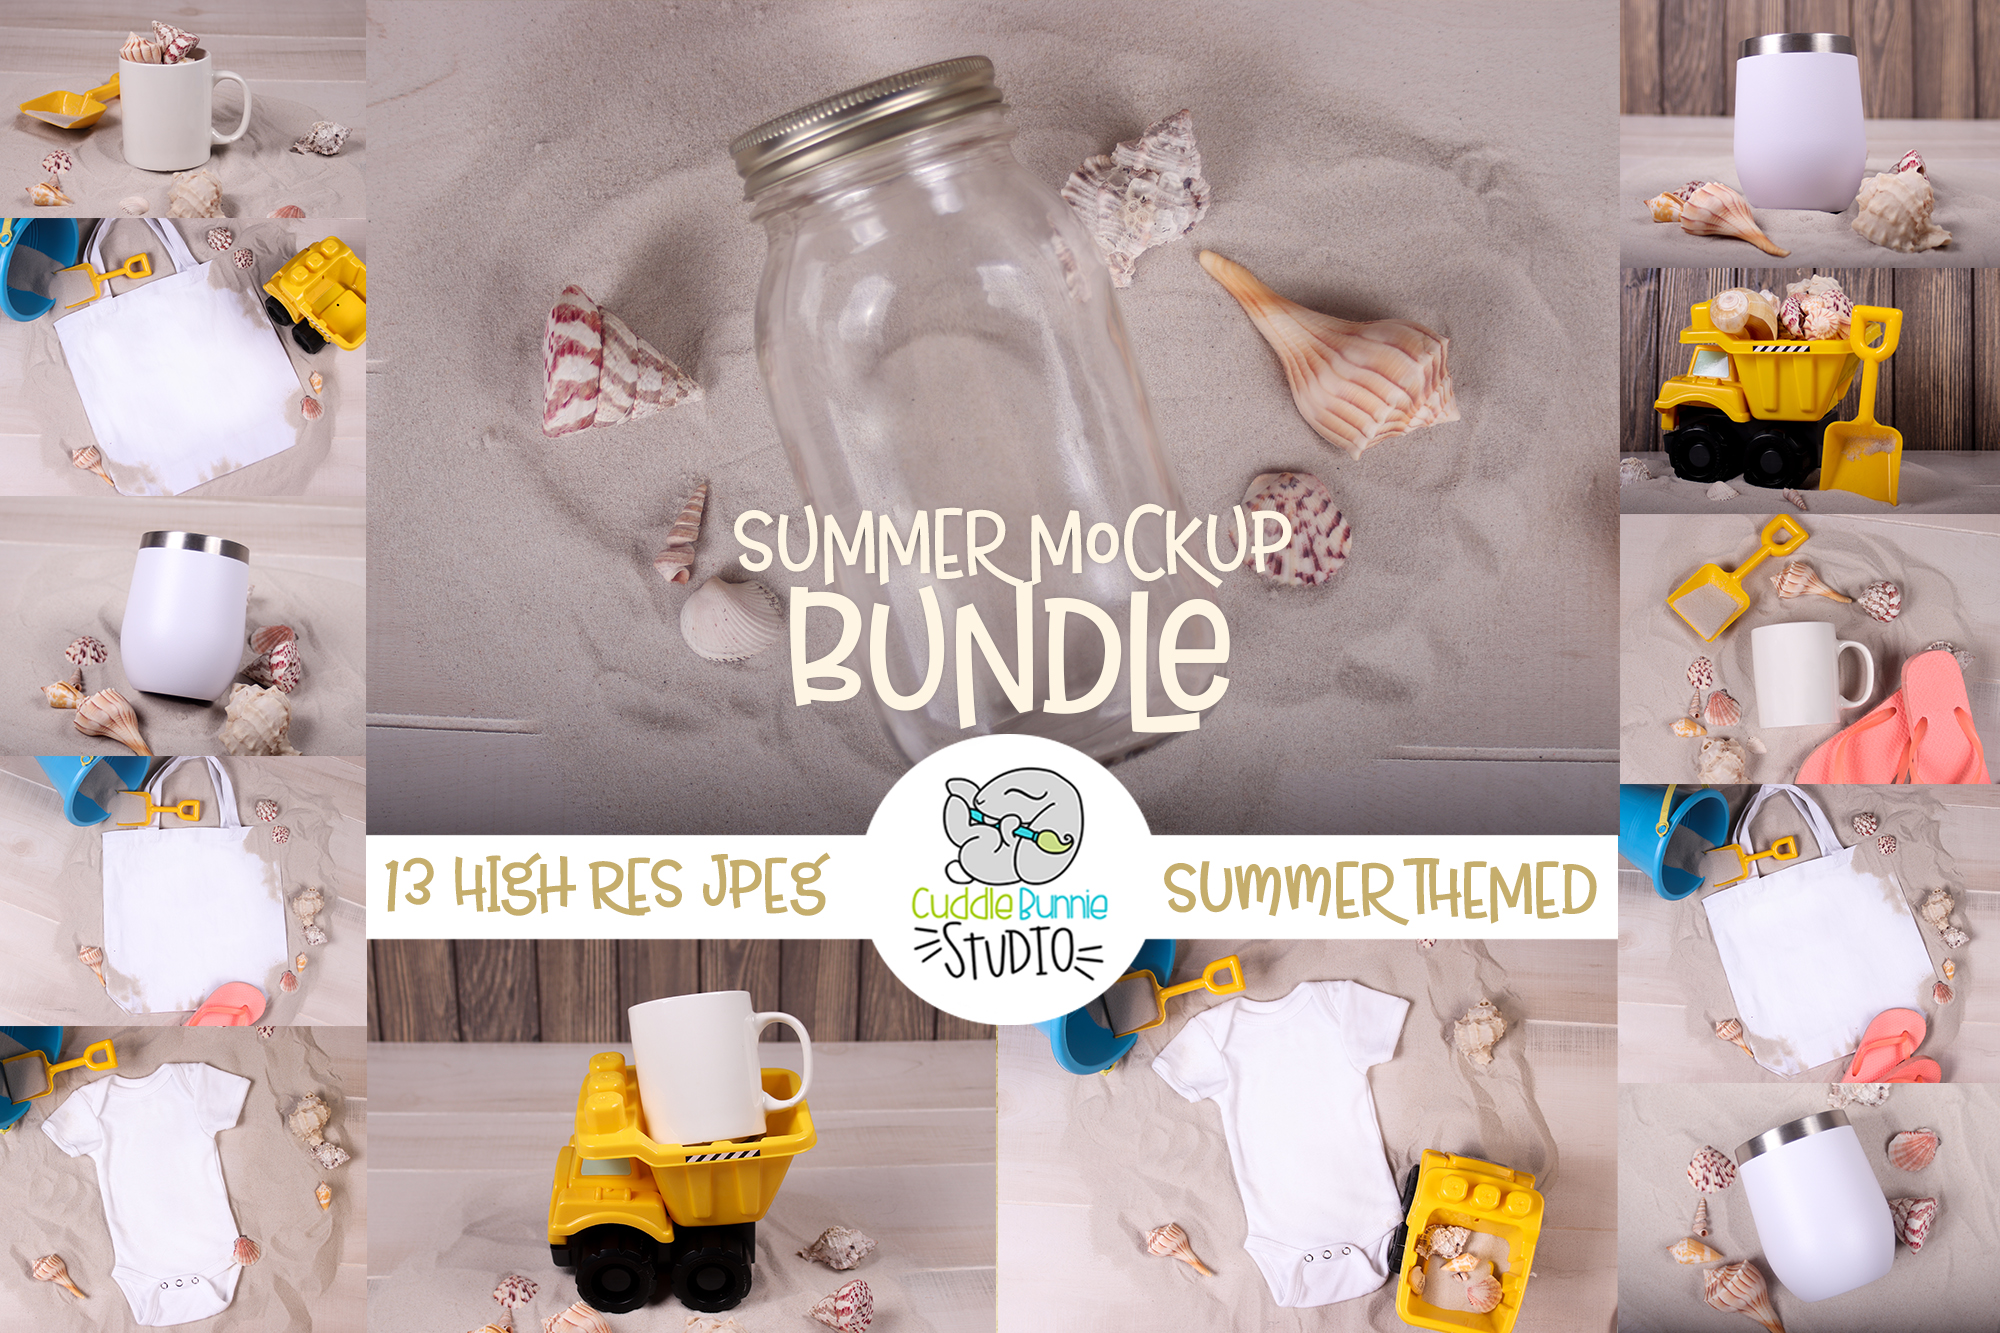 Summer Mockup | A Variety of Summer Themed Mockups example image 1